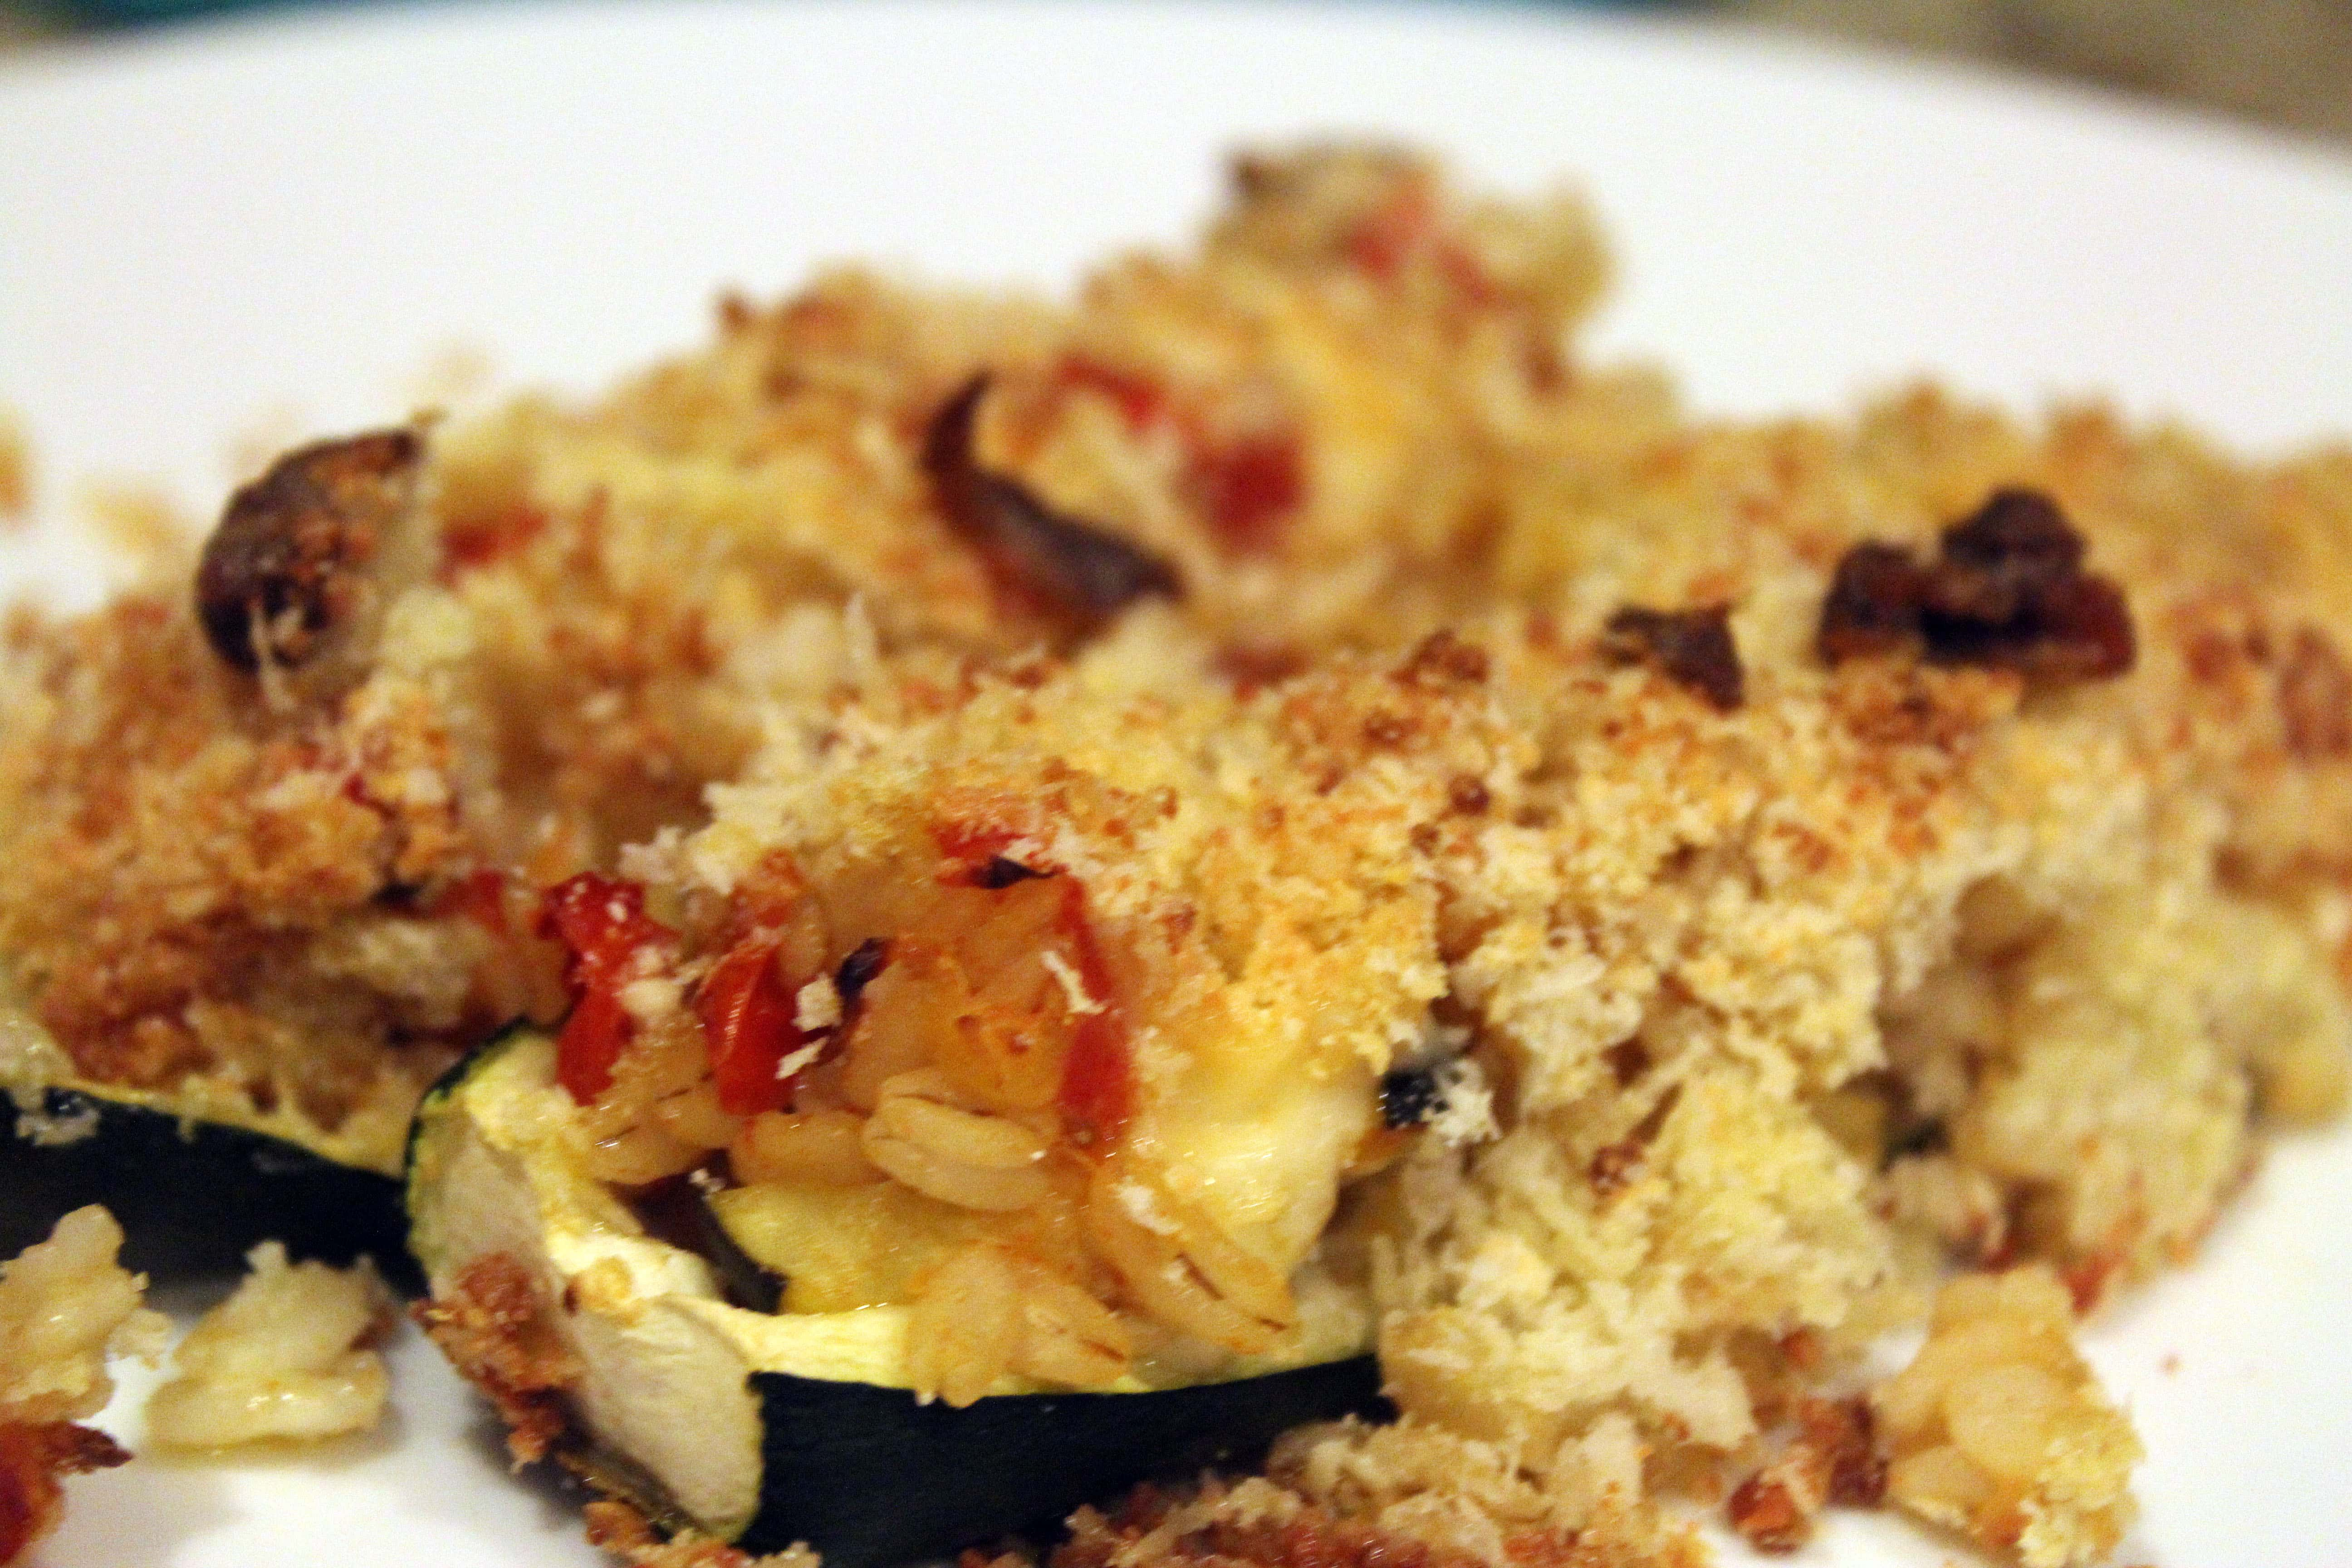 Zucchini on a plate